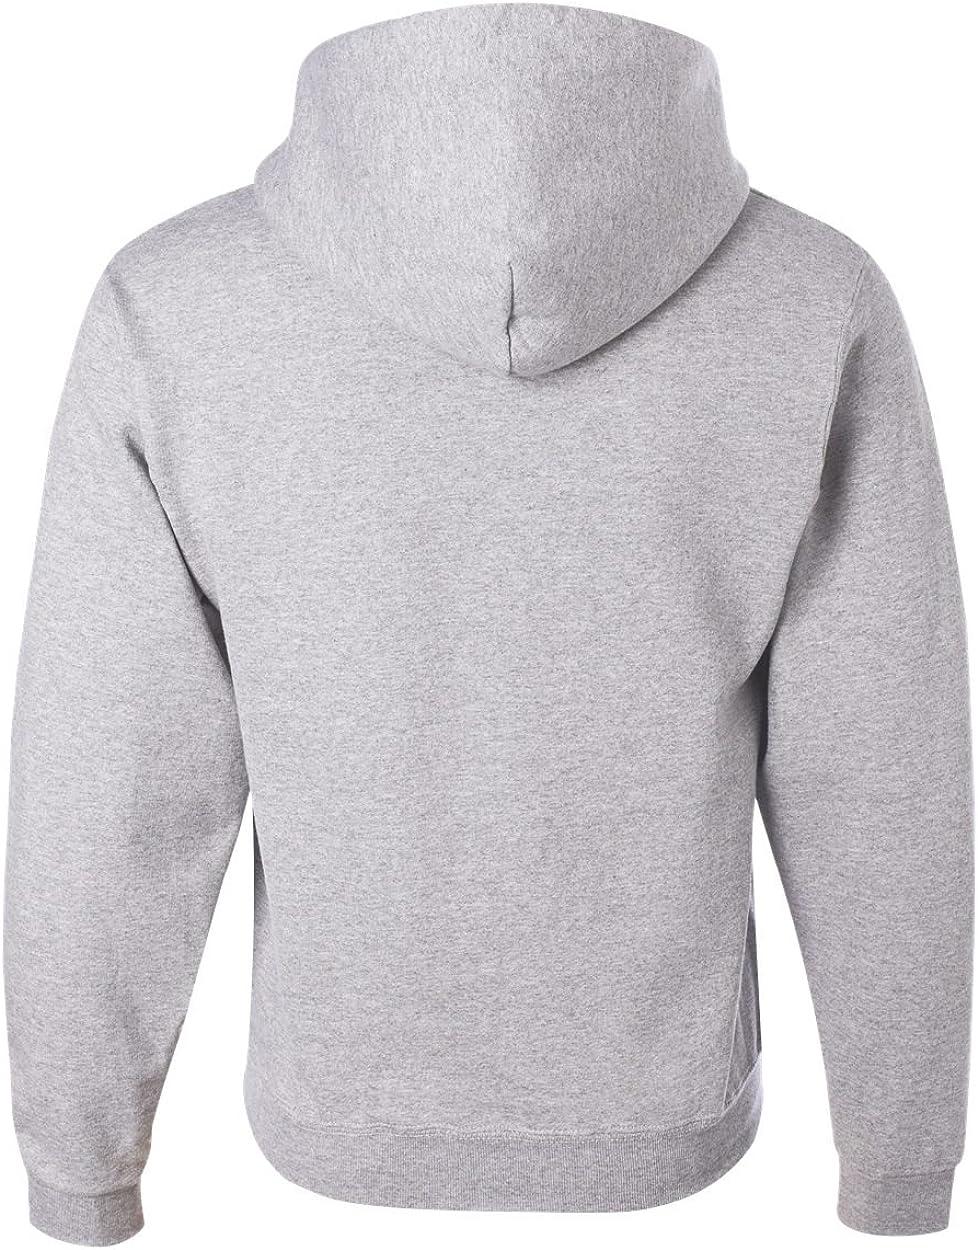 Birch Silver NuBlend 50//50 Pullover Hood Medium Jerzees 8 oz